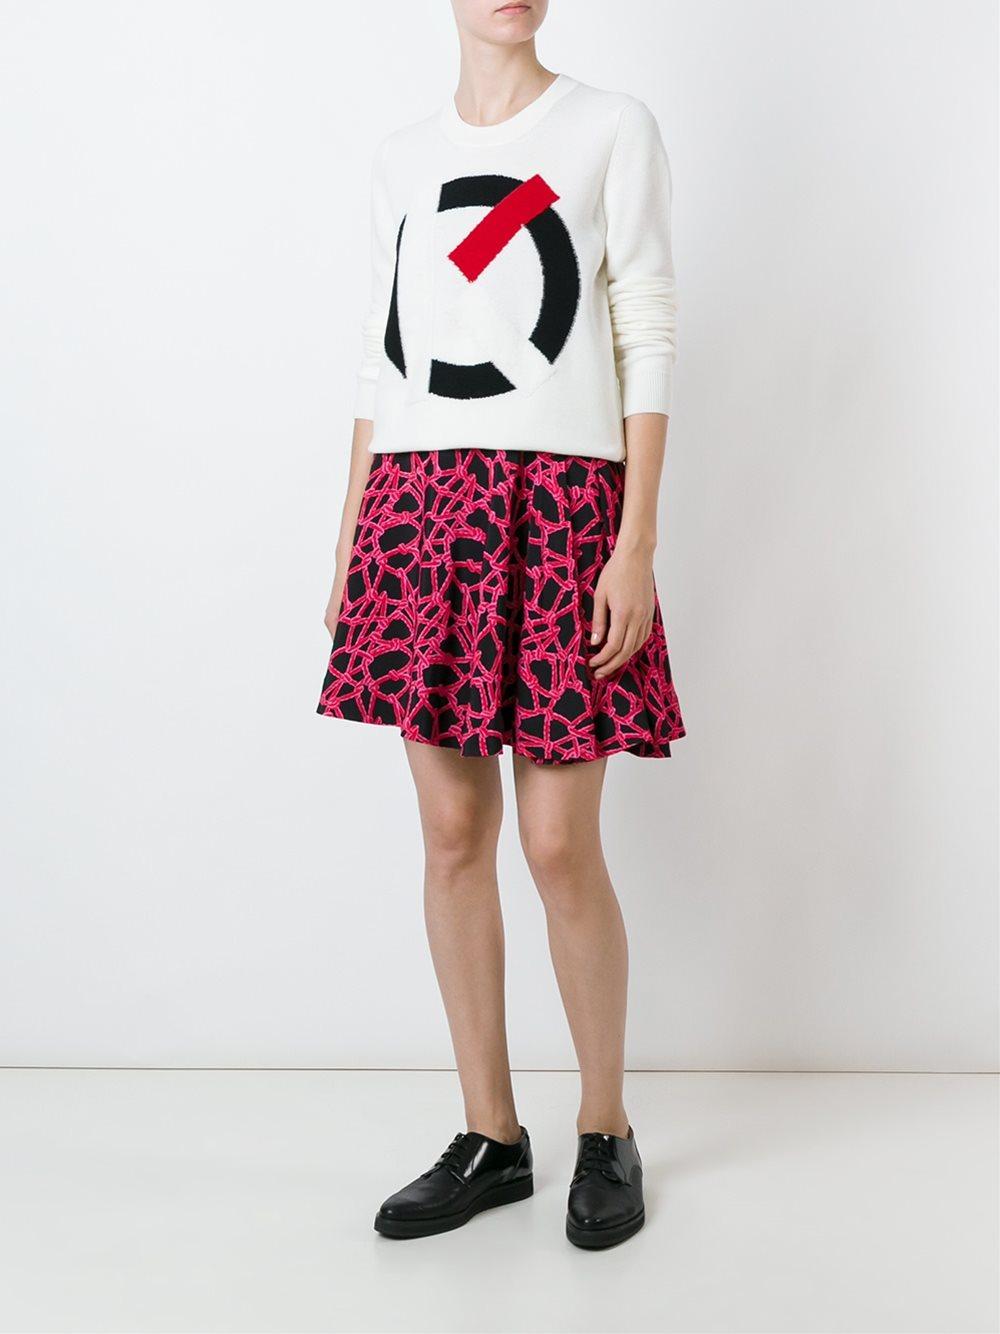 À Pull Femme D'ecran kenzo Fond Kenzo l Clothing K Intarsia Tigre P8wkn0O